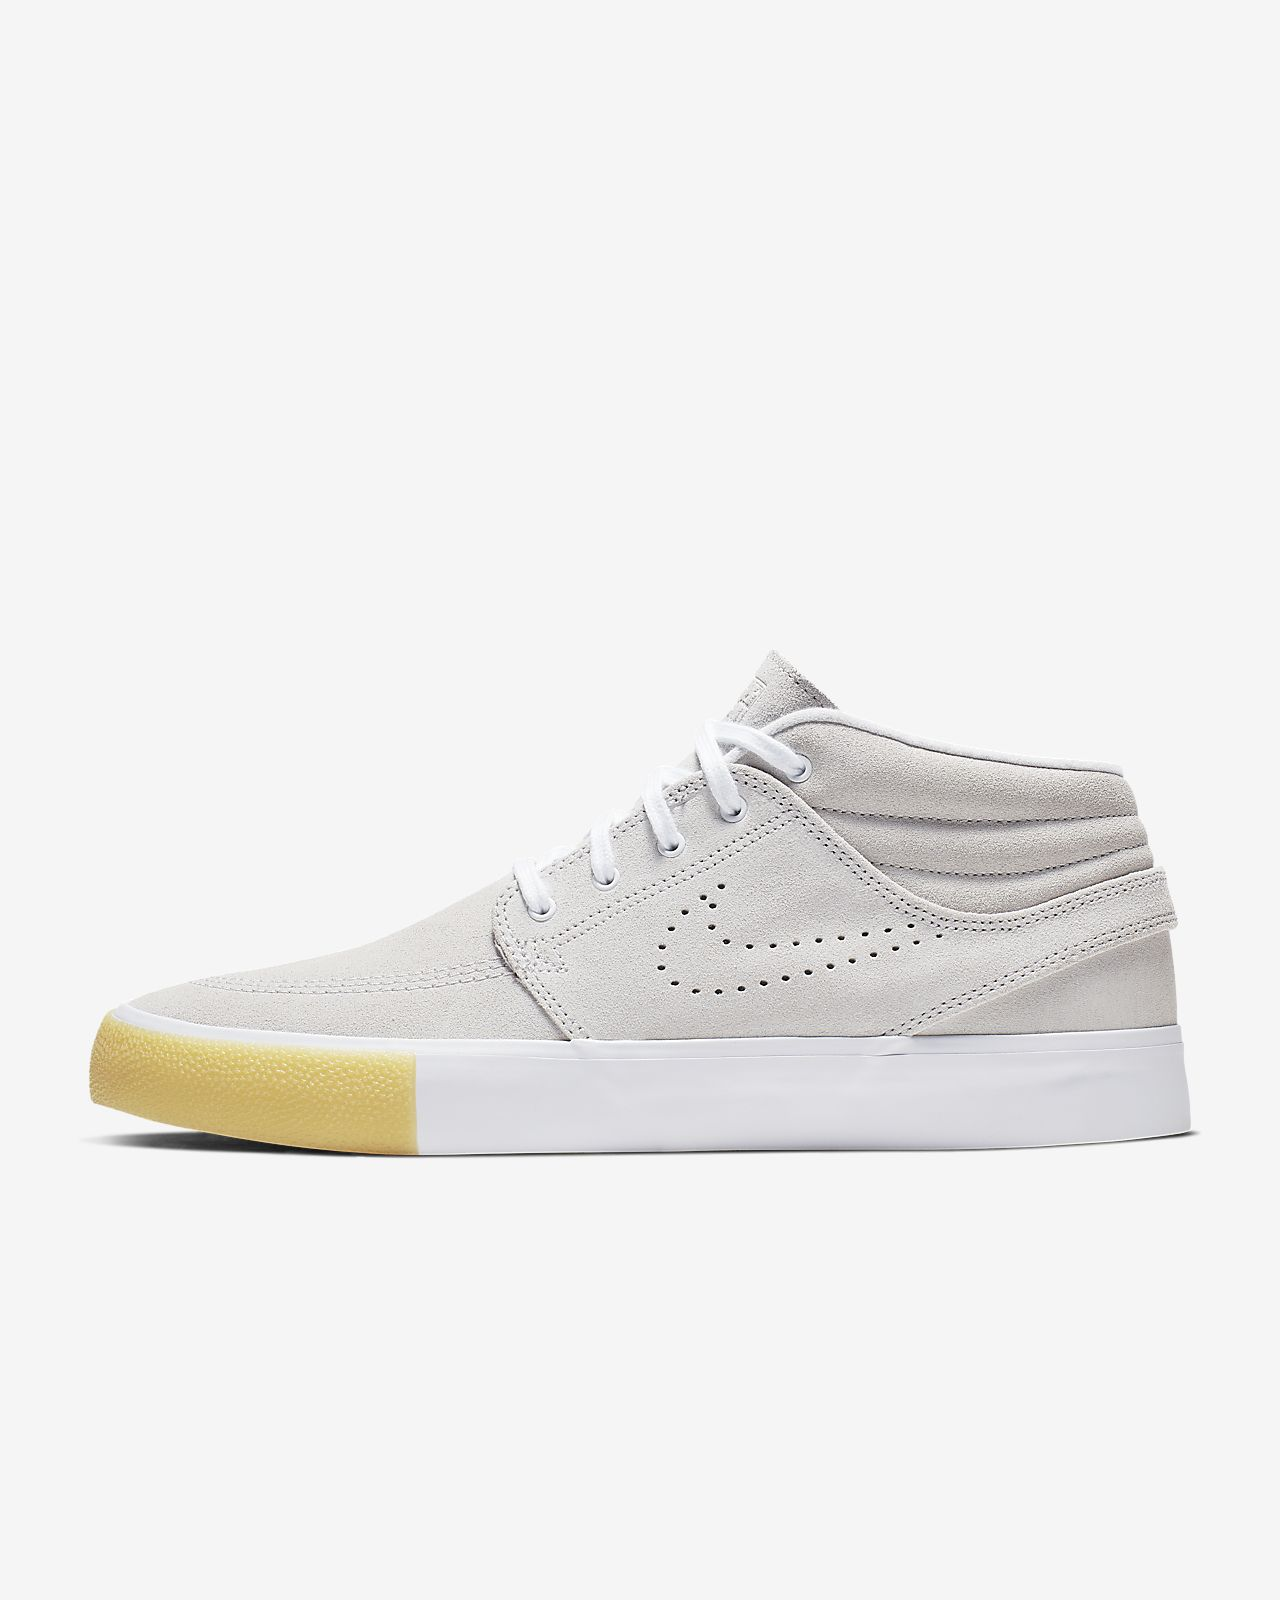 Nike SB Zoom Janoski Mid RM SE Skate Shoe